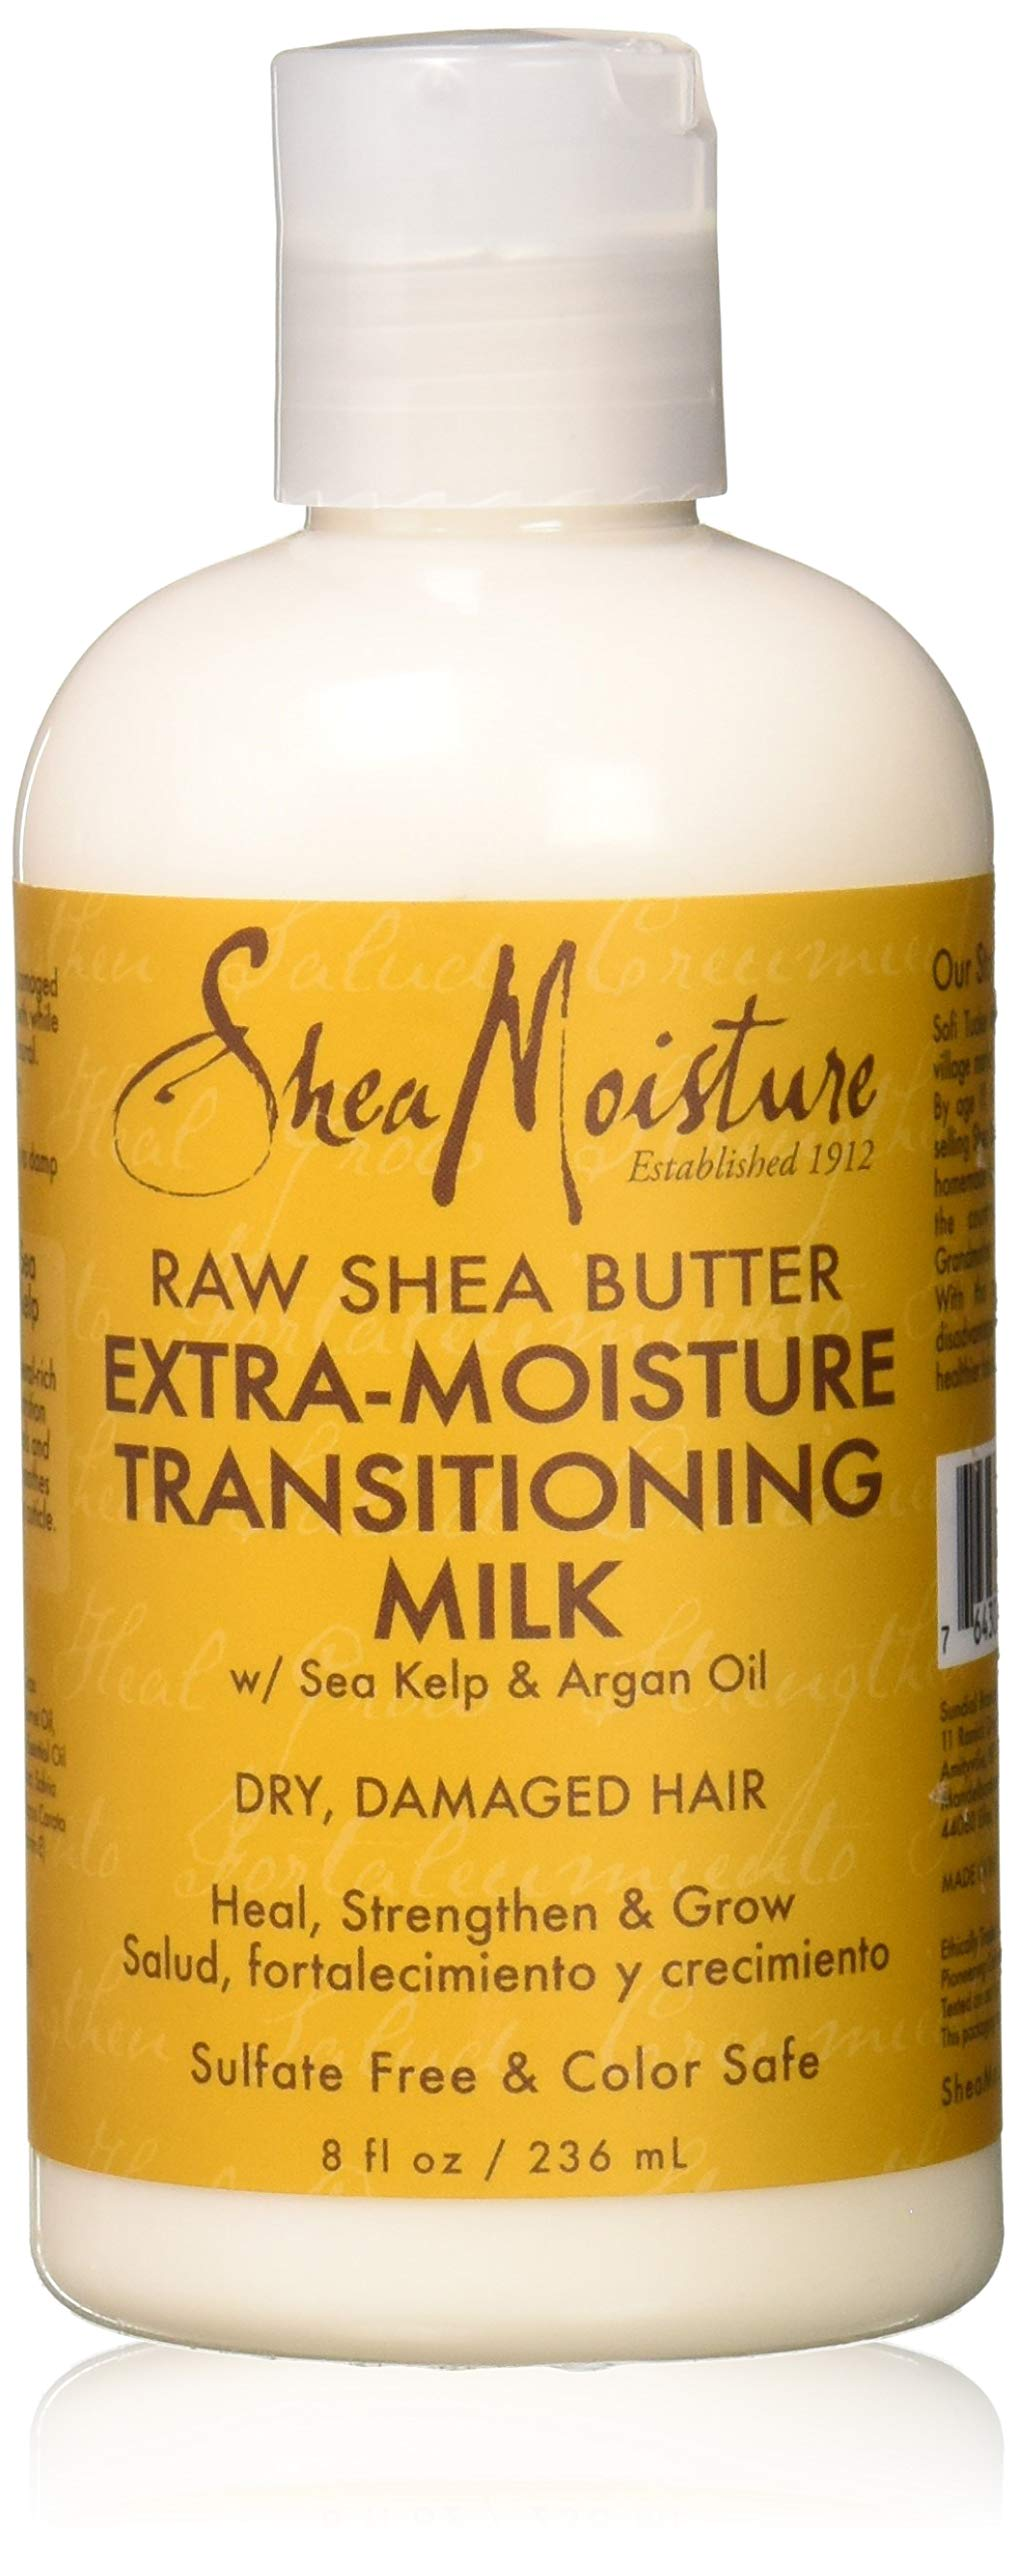 SheaMoisture Raw Shea Butter Extra-Moisture Transitioning Milk, 8 Ounce